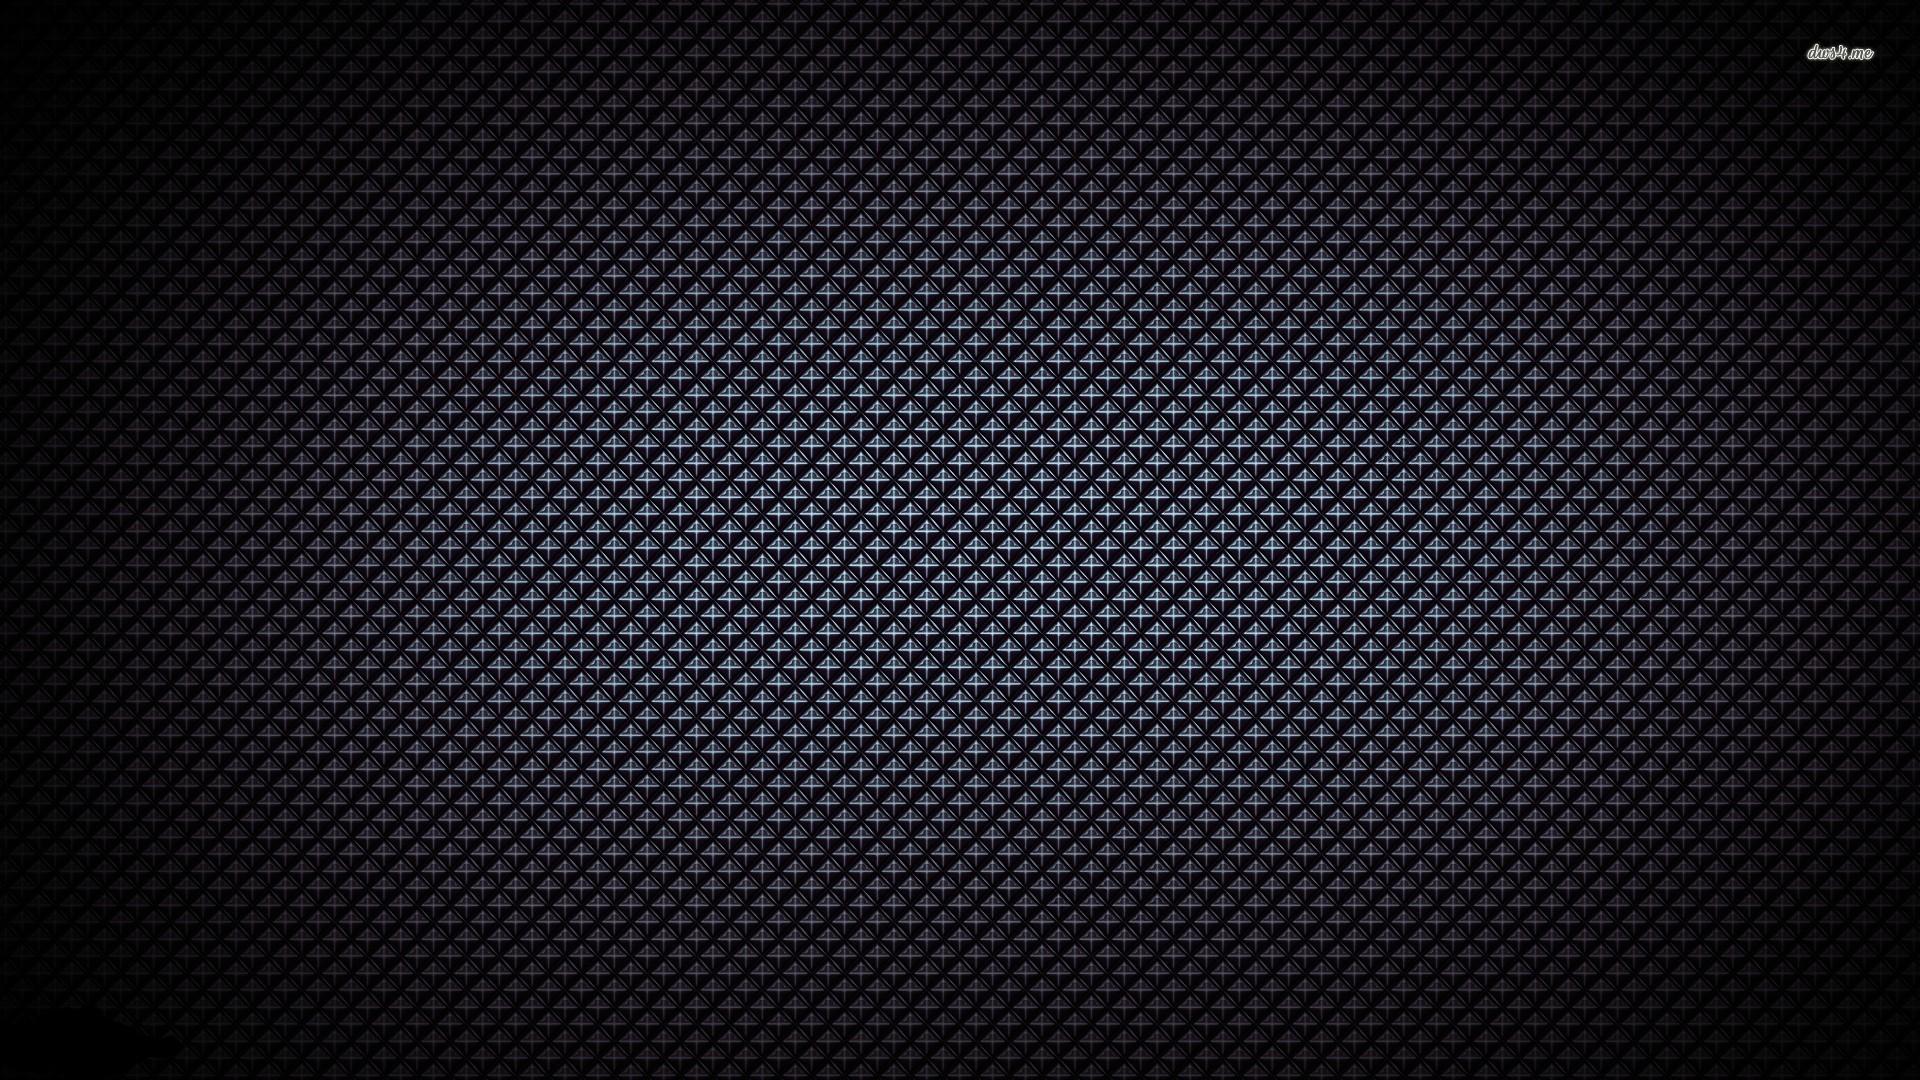 Diamond Shape Wallpaper - WallpaperSafari